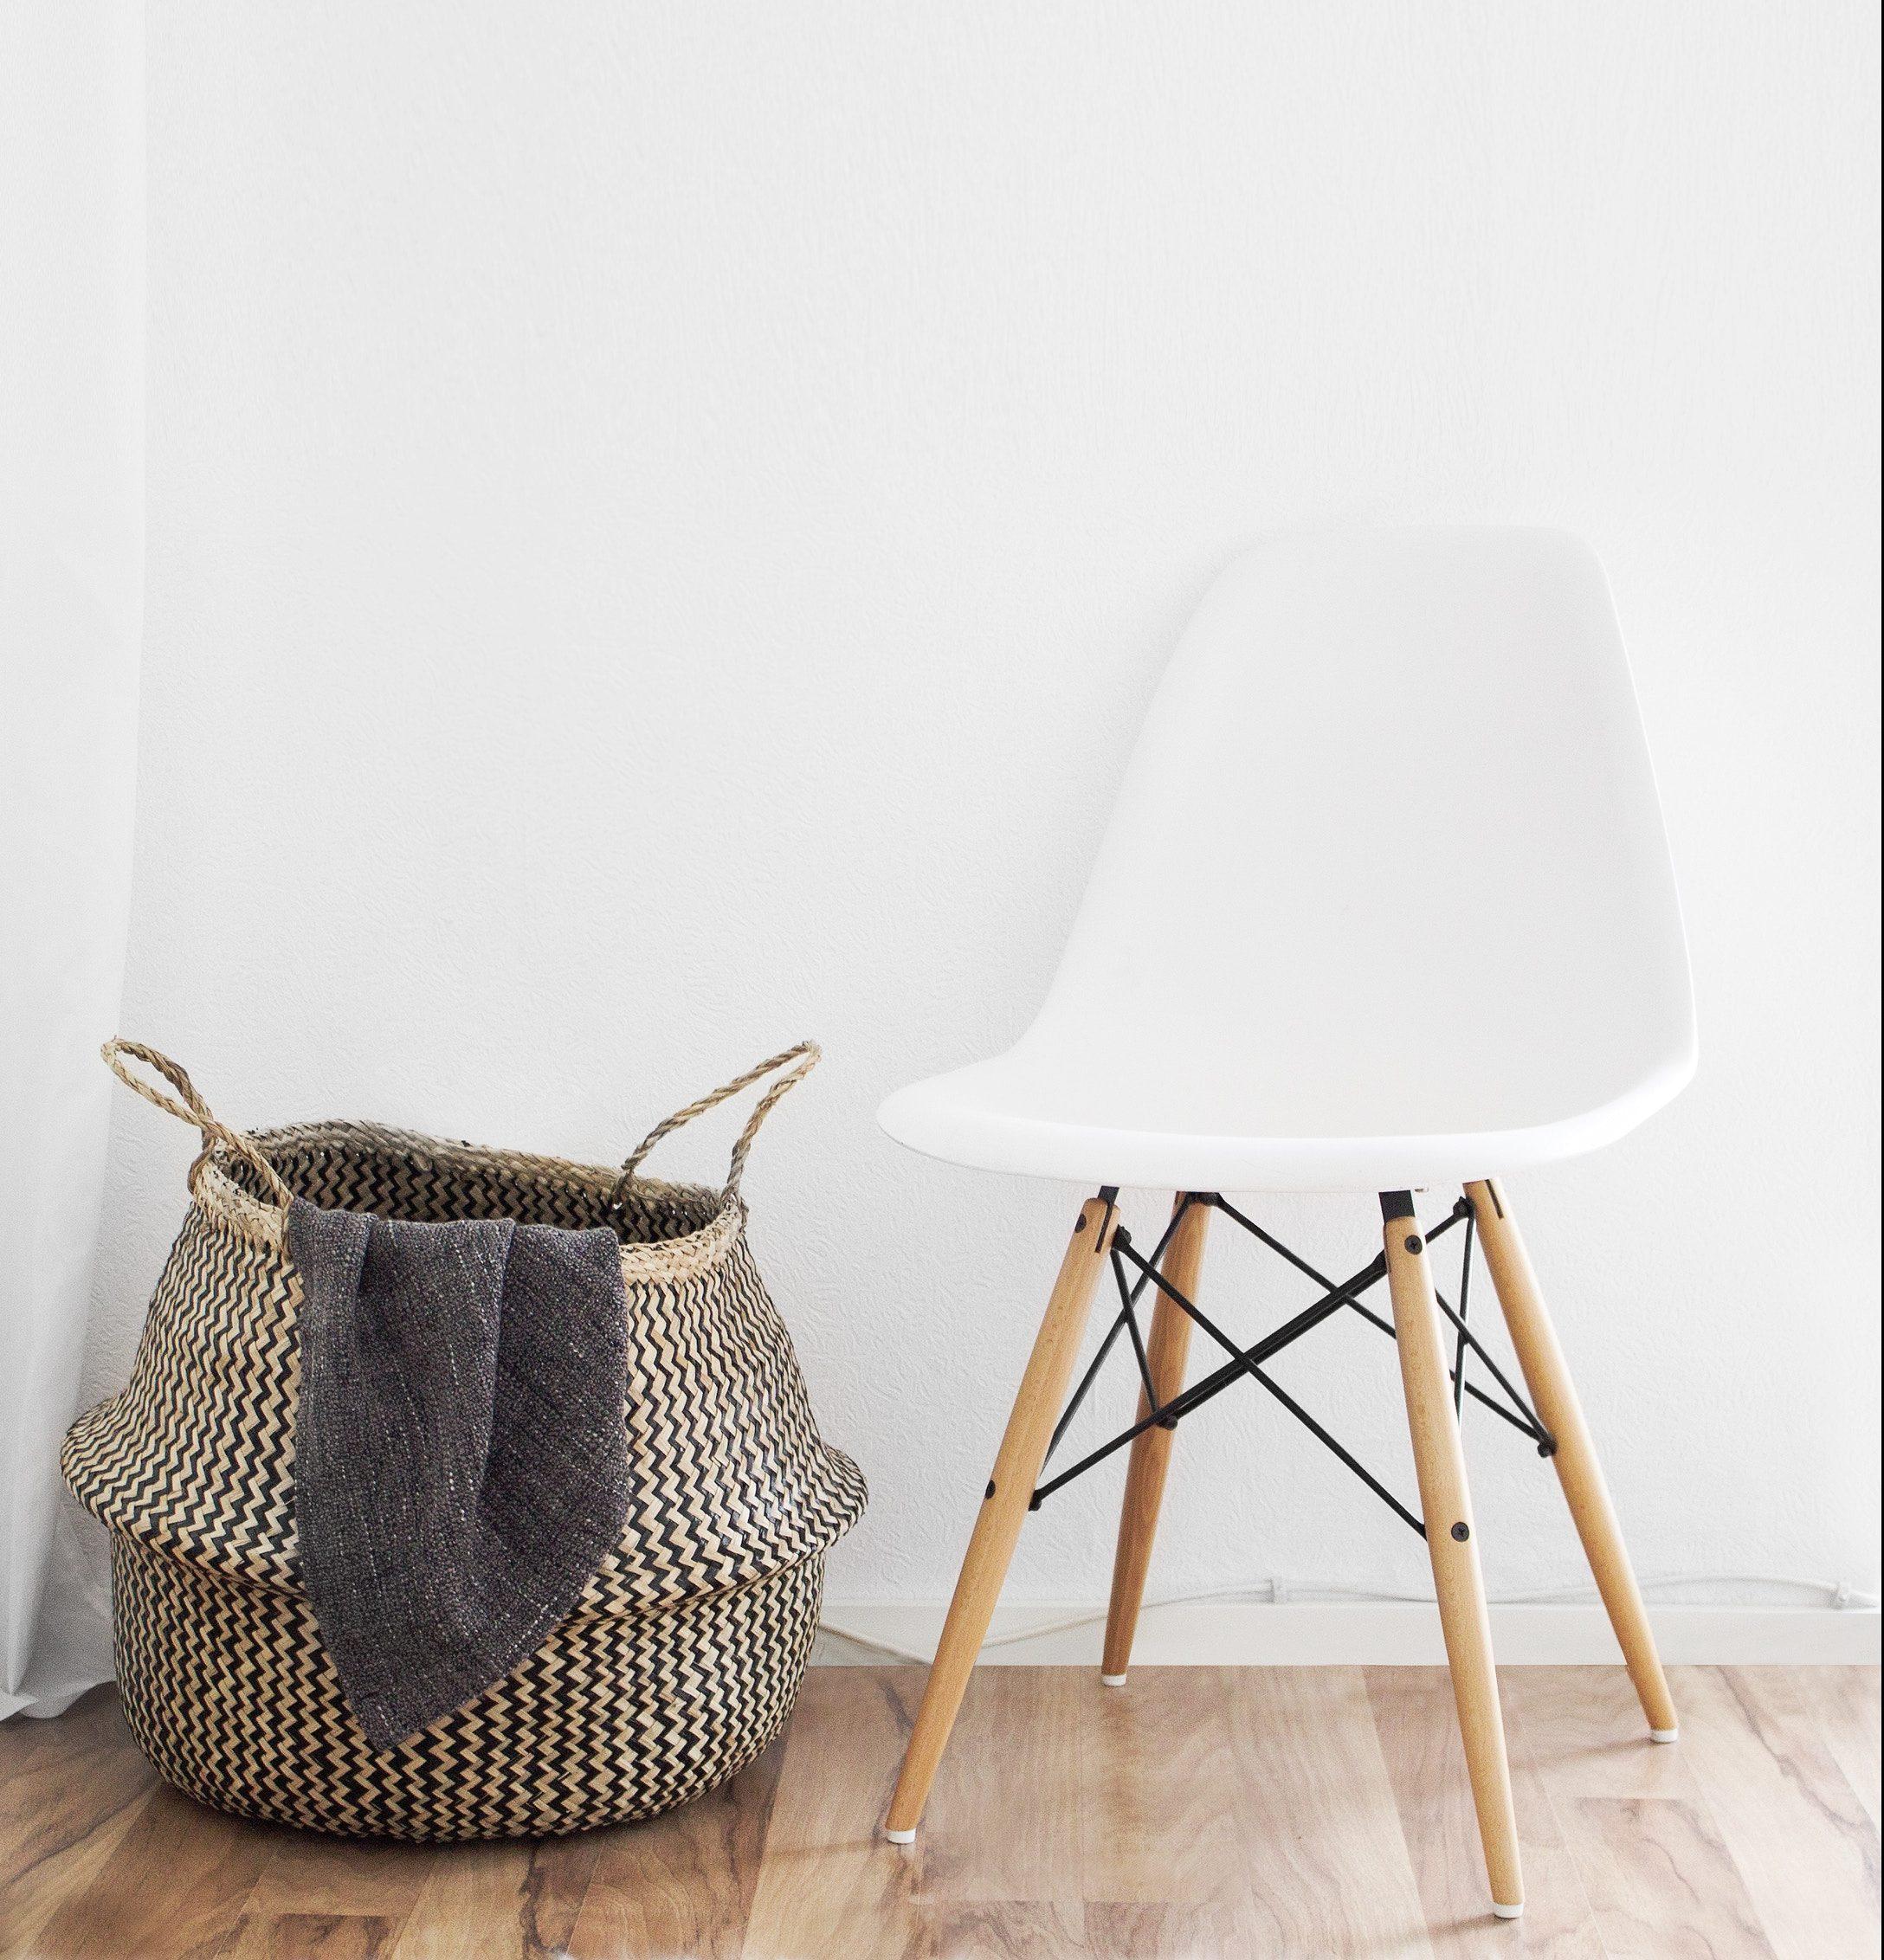 Laundry Basket Detoxify your Laundry with Castile Soap